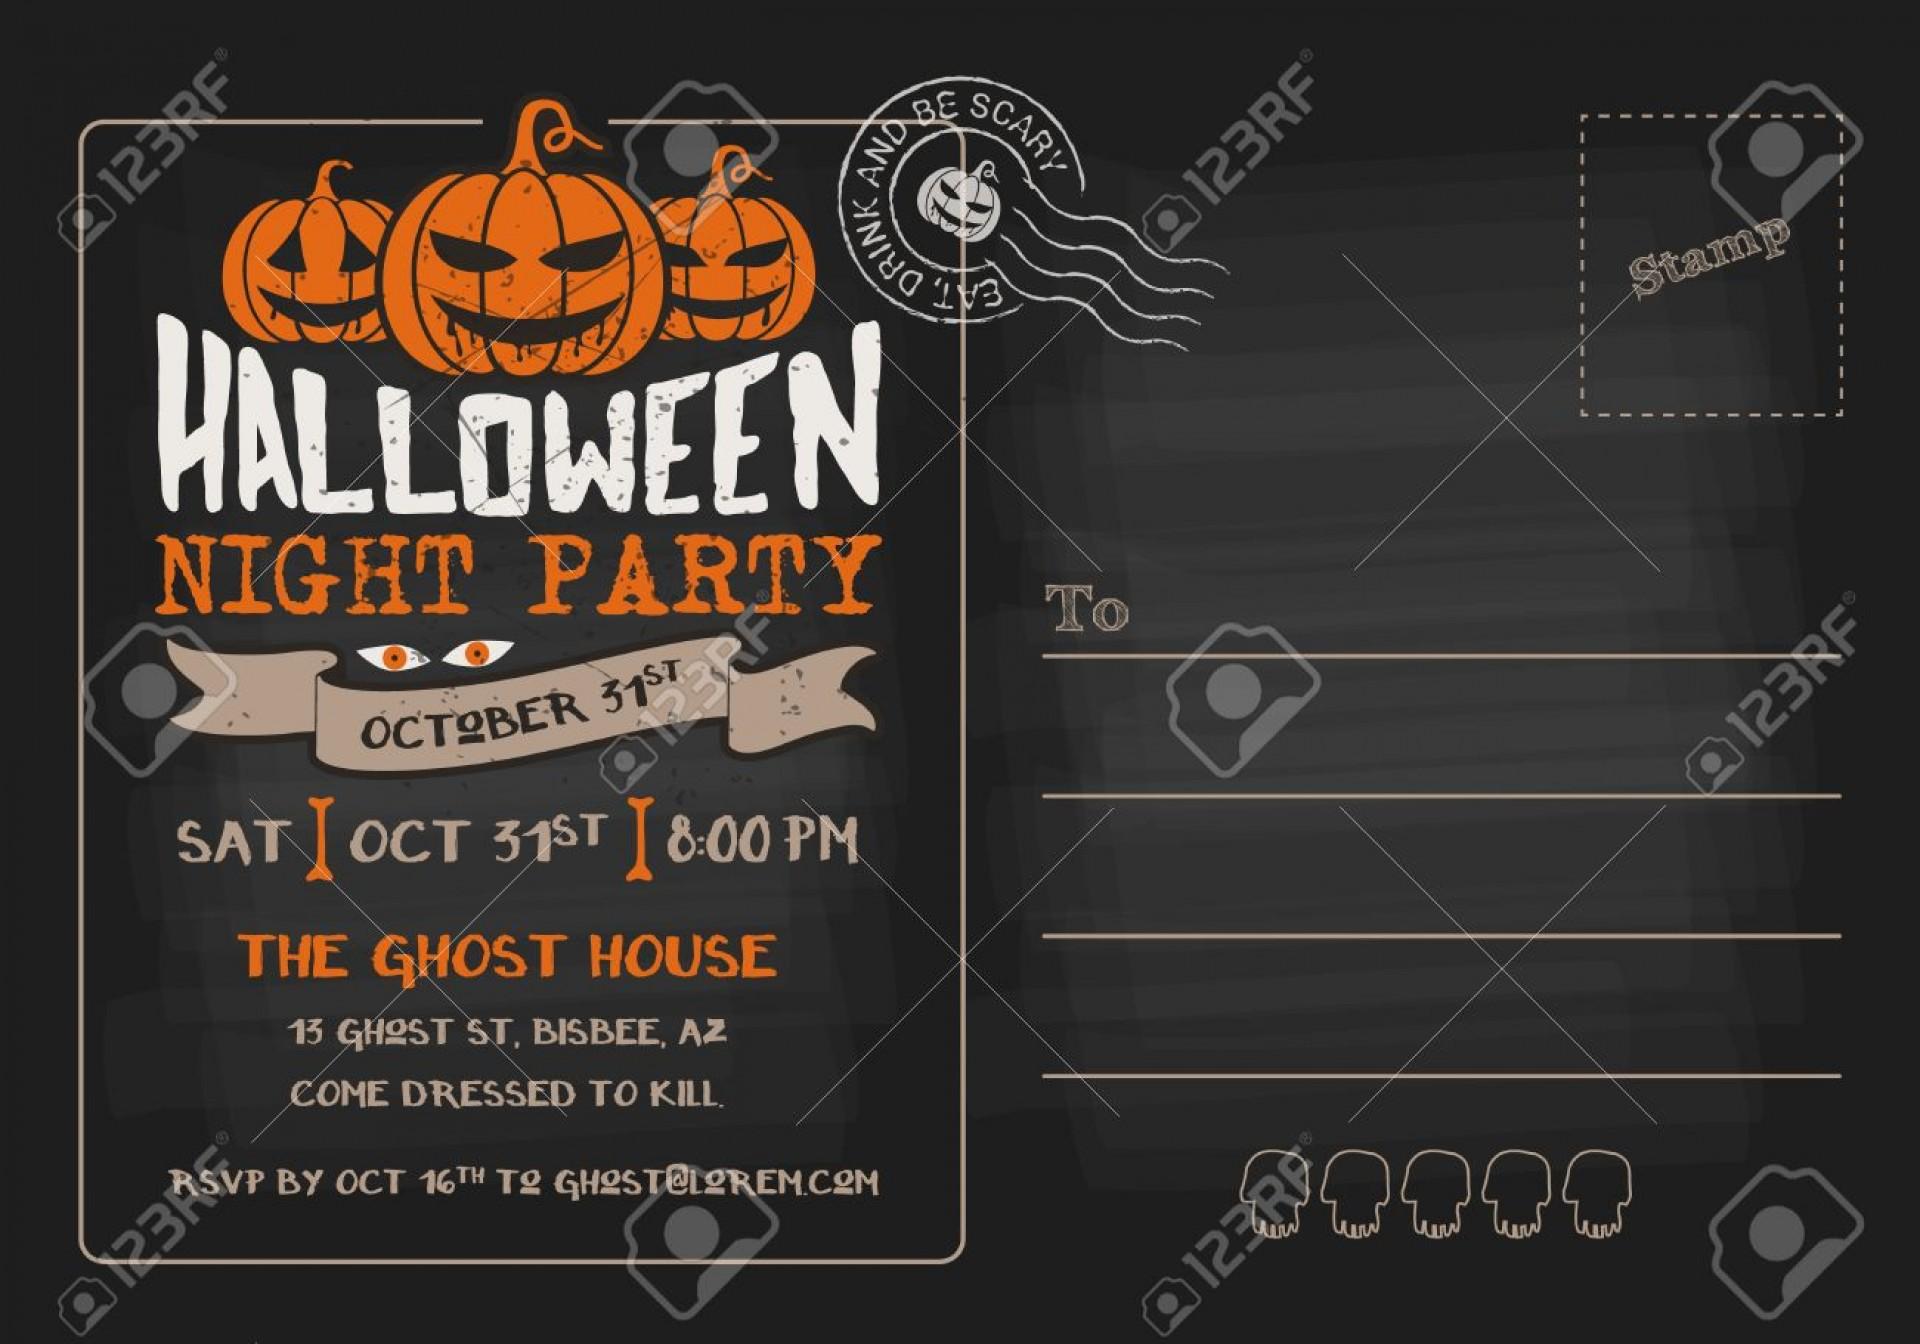 006 Striking Halloween Party Invitation Template Design  Microsoft Block October1920